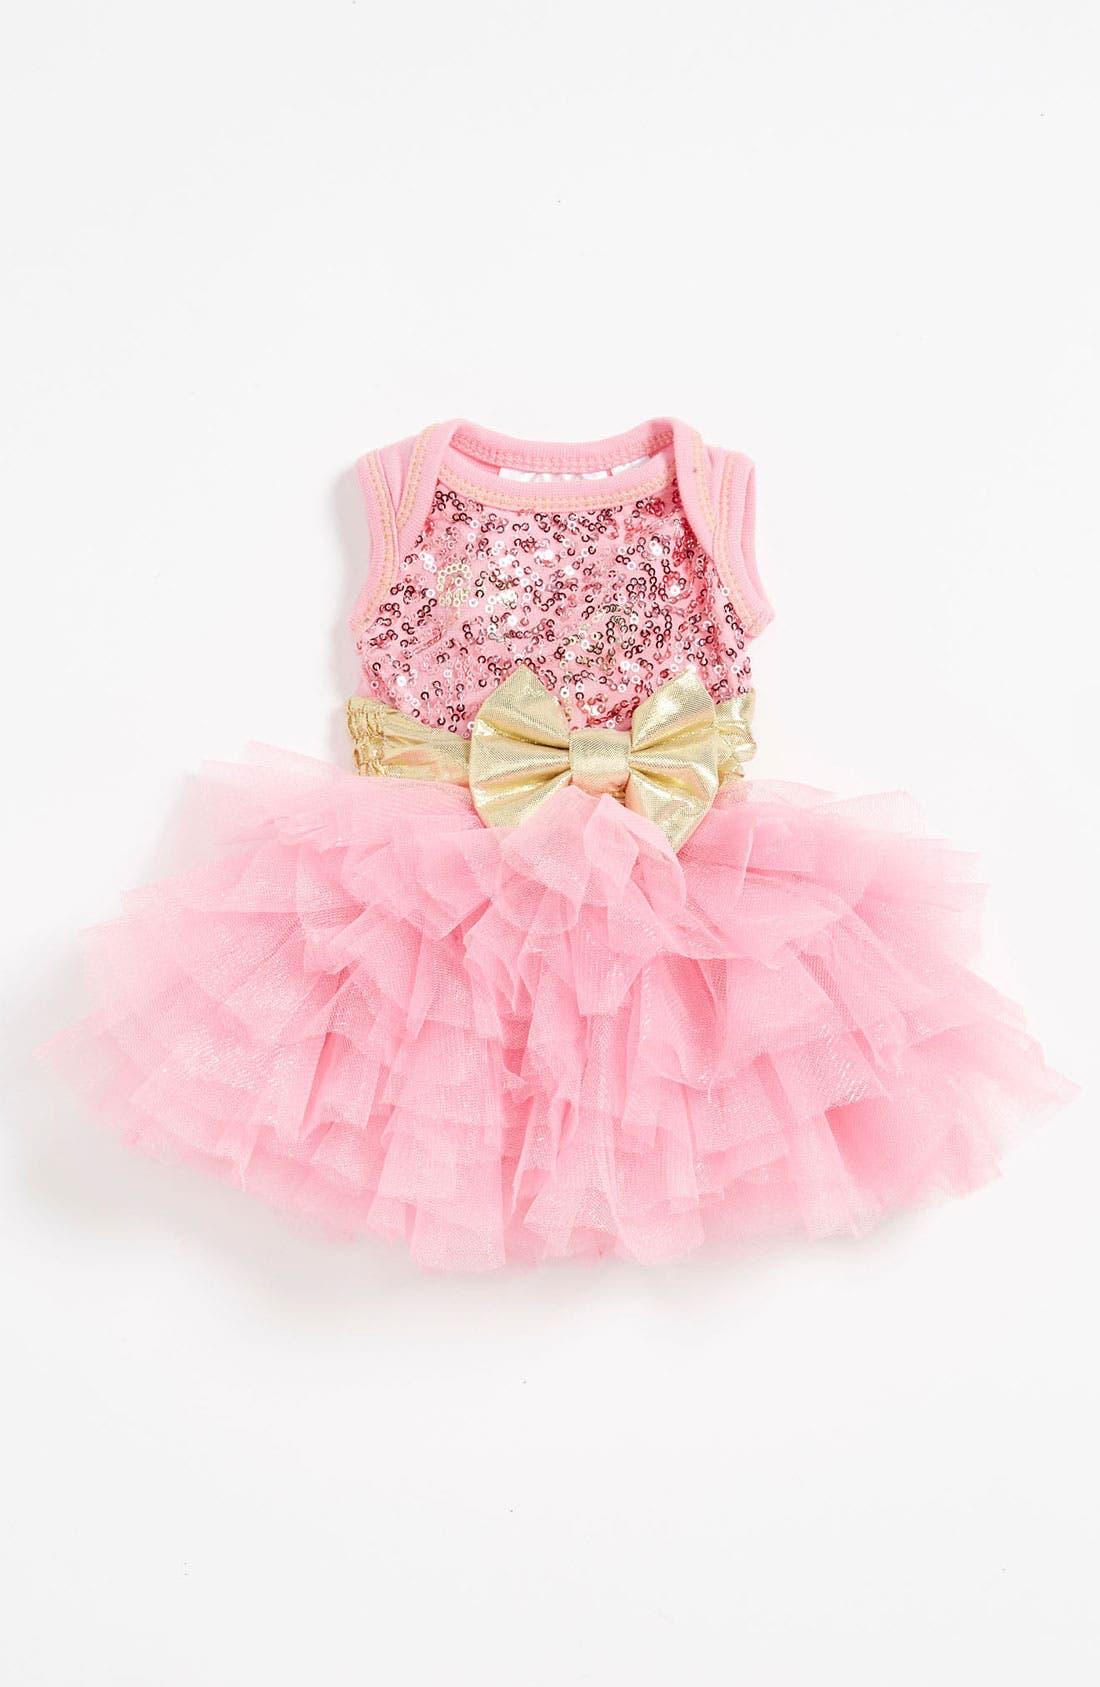 Main Image - Ooh! La, La! Couture 'Wow Dream' Doll Dress